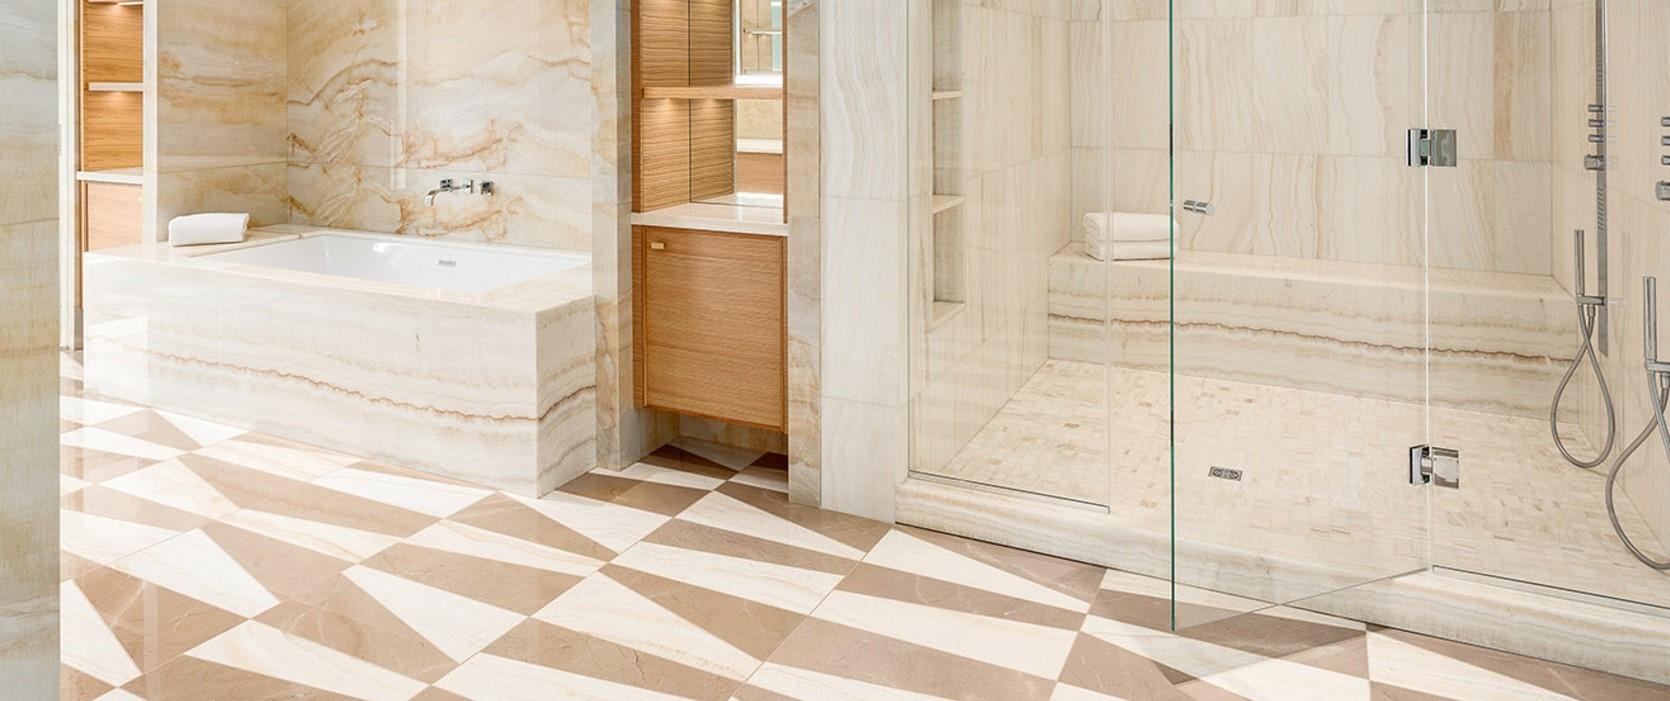 coal-harbour-penthouse-2 - Aeon Stone + Tile | Granite, Marble ...